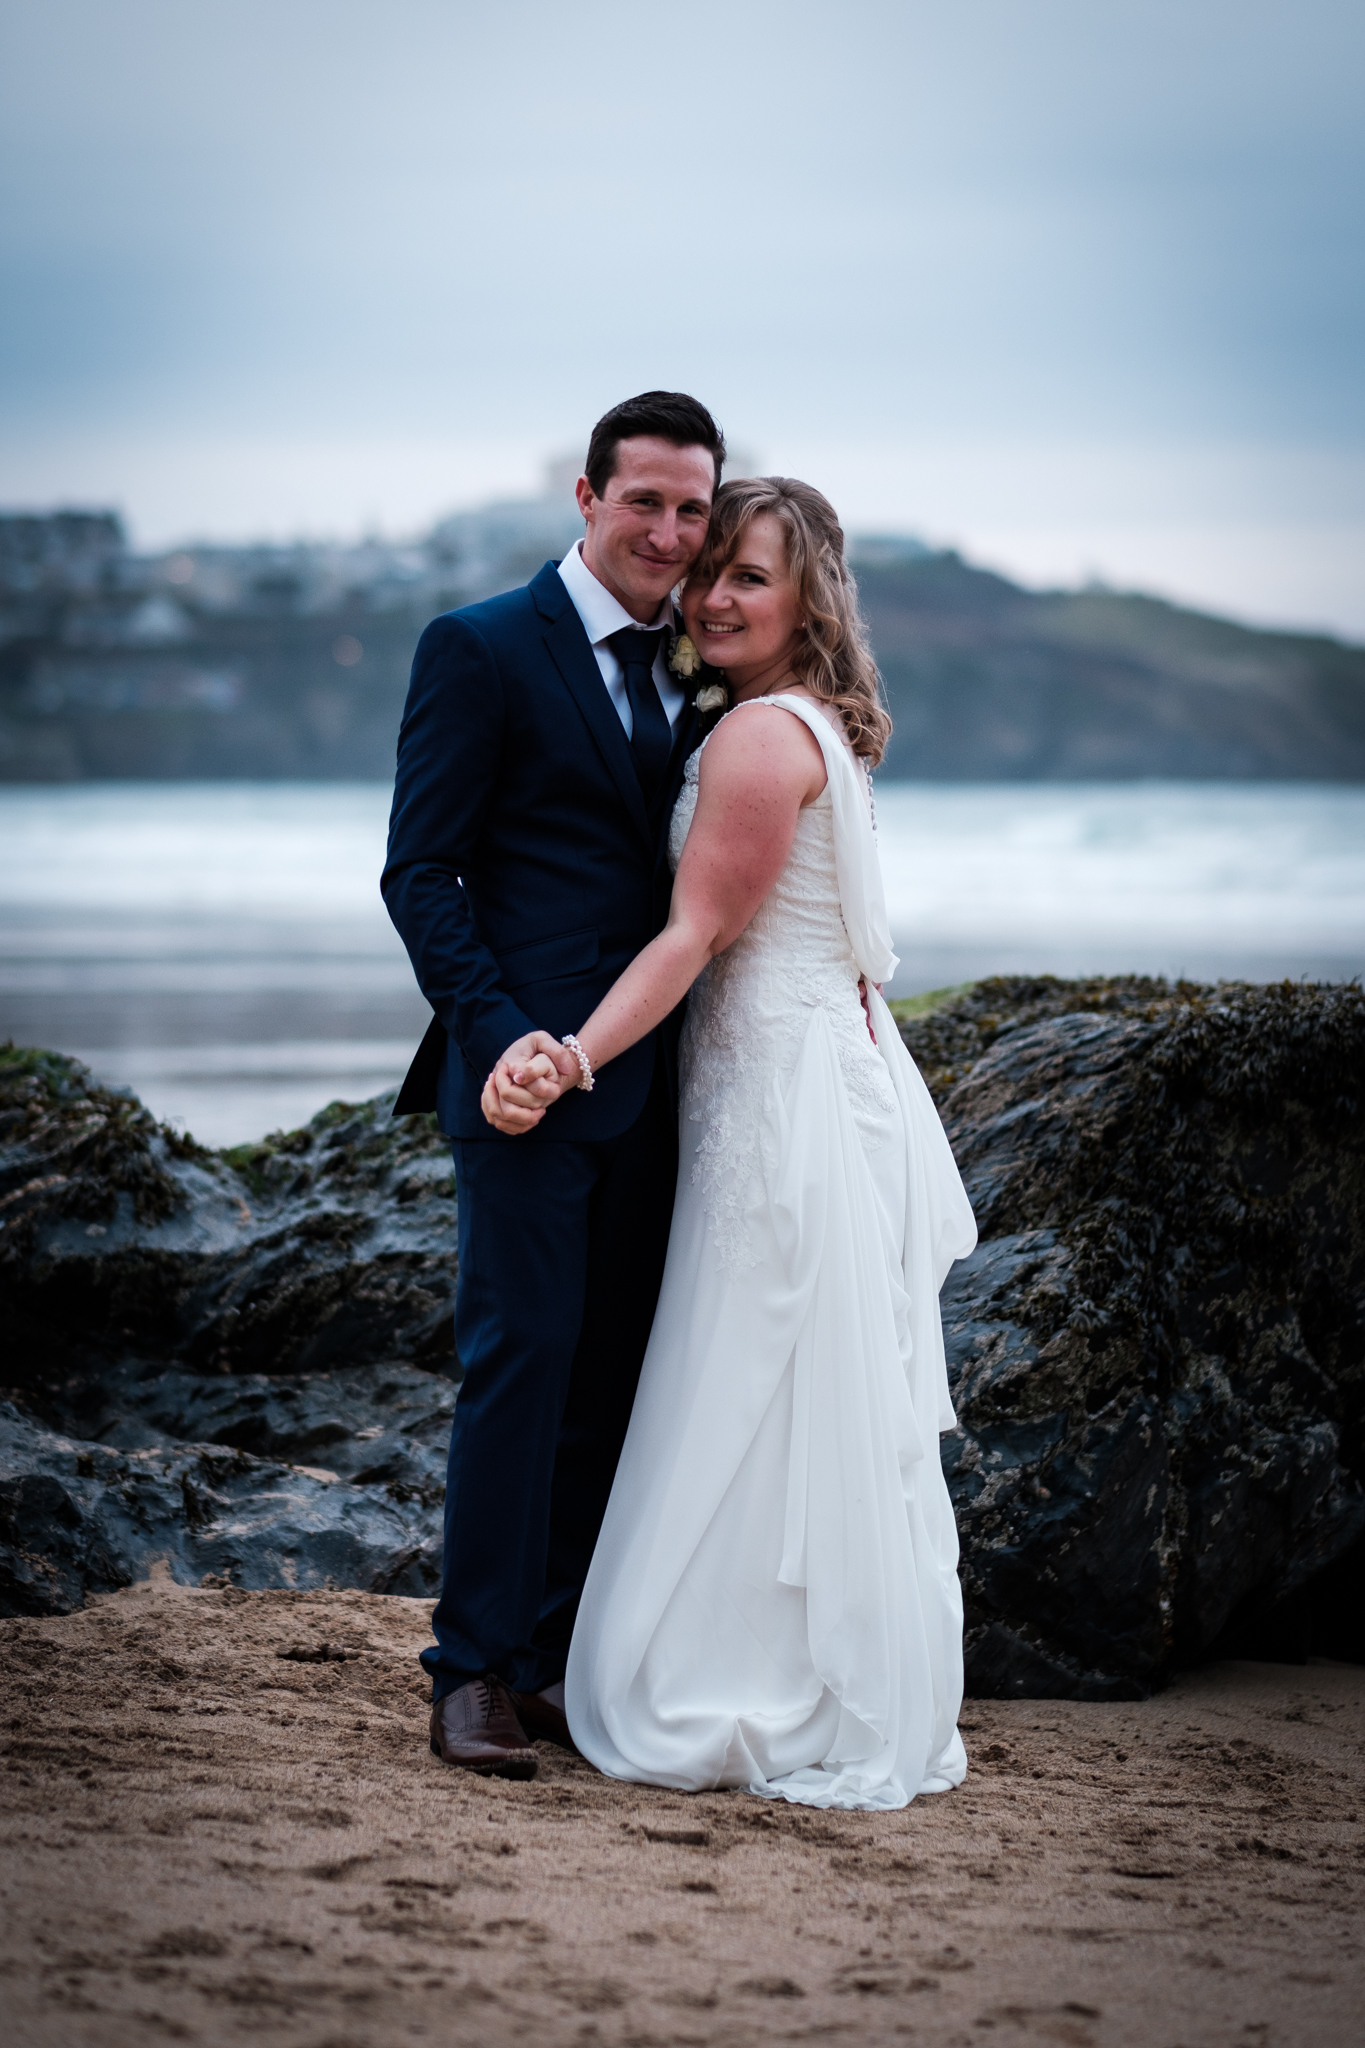 couple beach wedding love